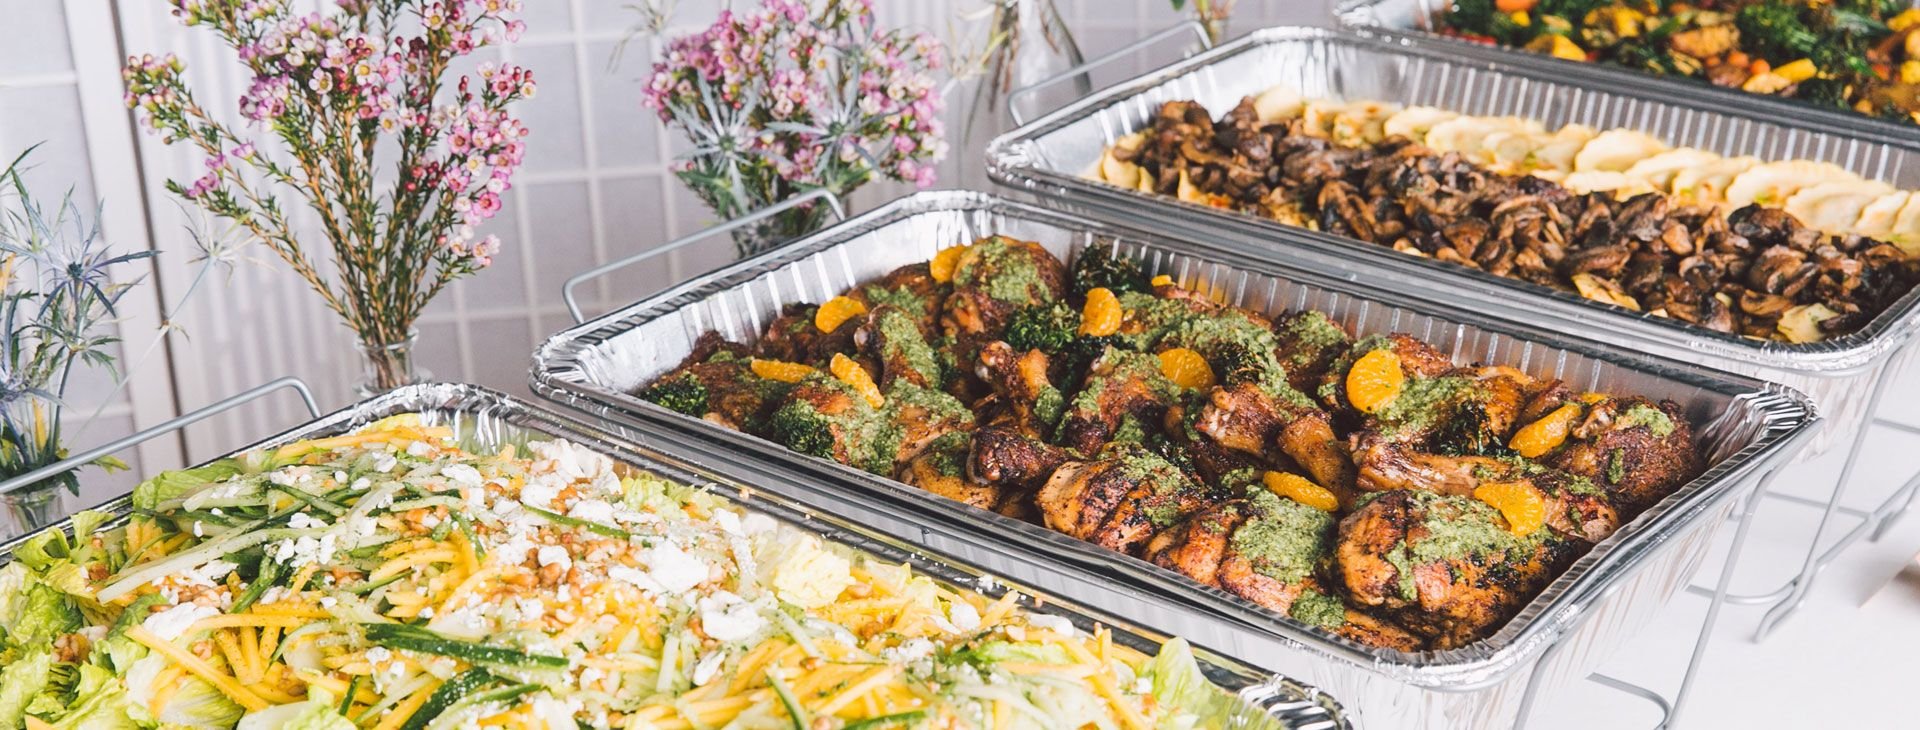 Catering Ve Toplu Yemek Firmasi Kubra Catering